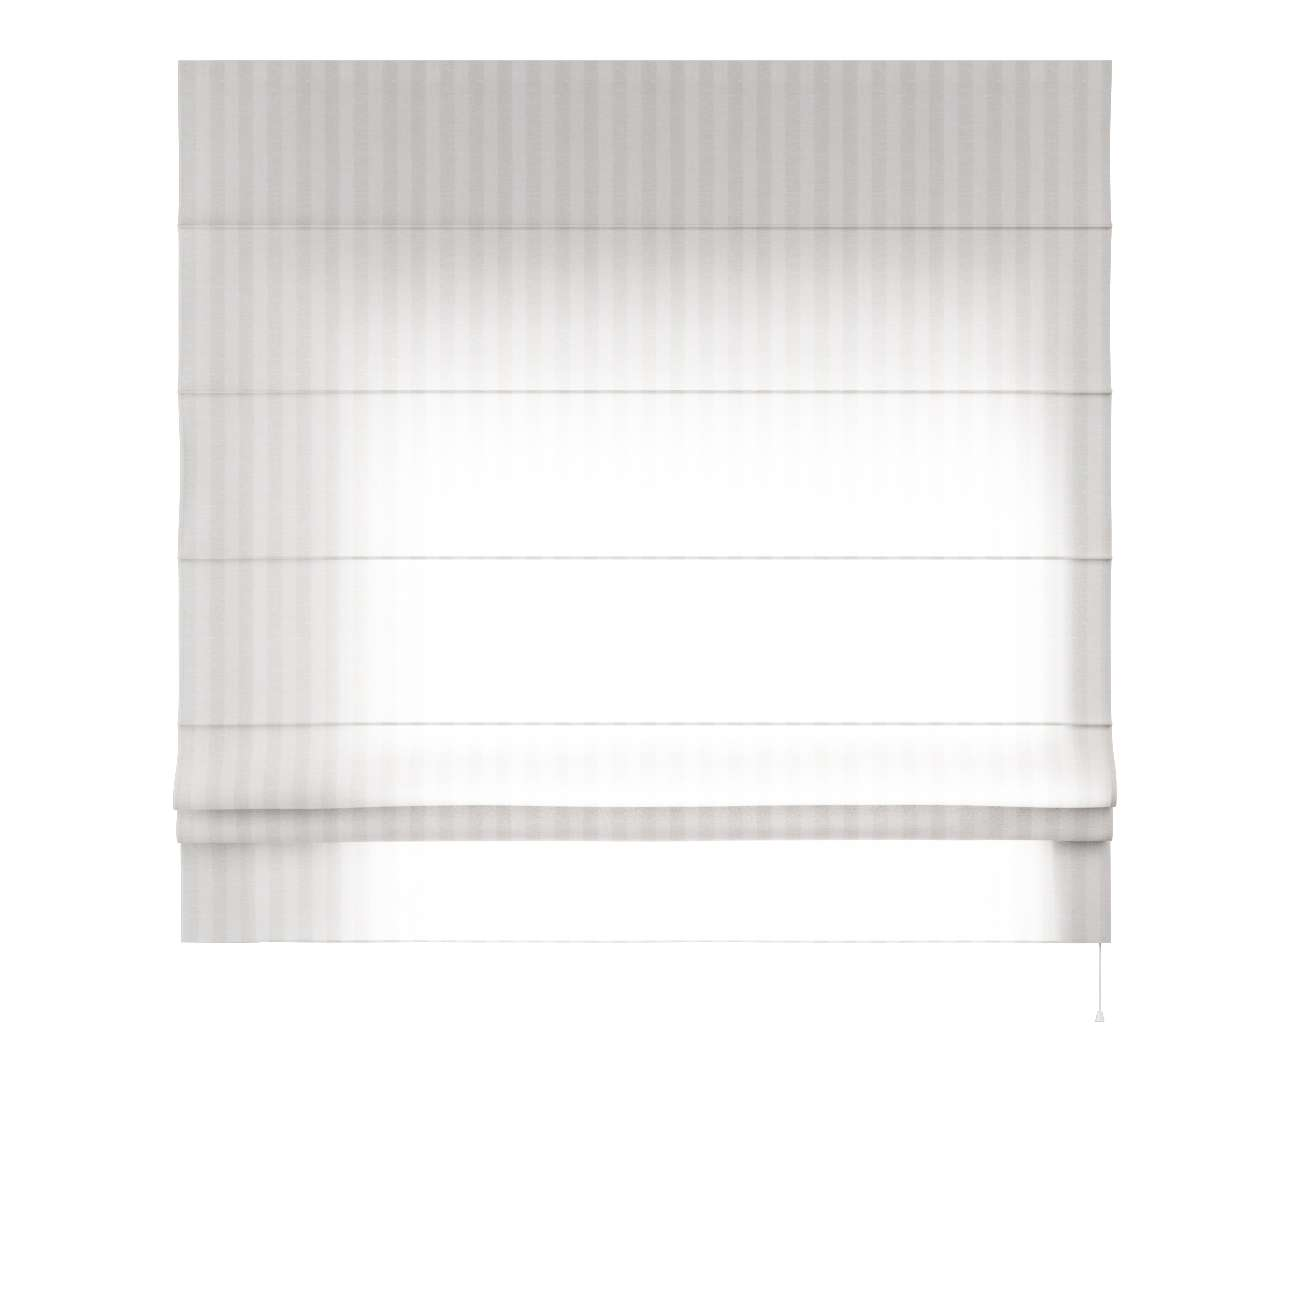 Foldegardin Paris<br/>Med lige flæse 80 × 170 cm fra kollektionen Linen, Stof: 392-03